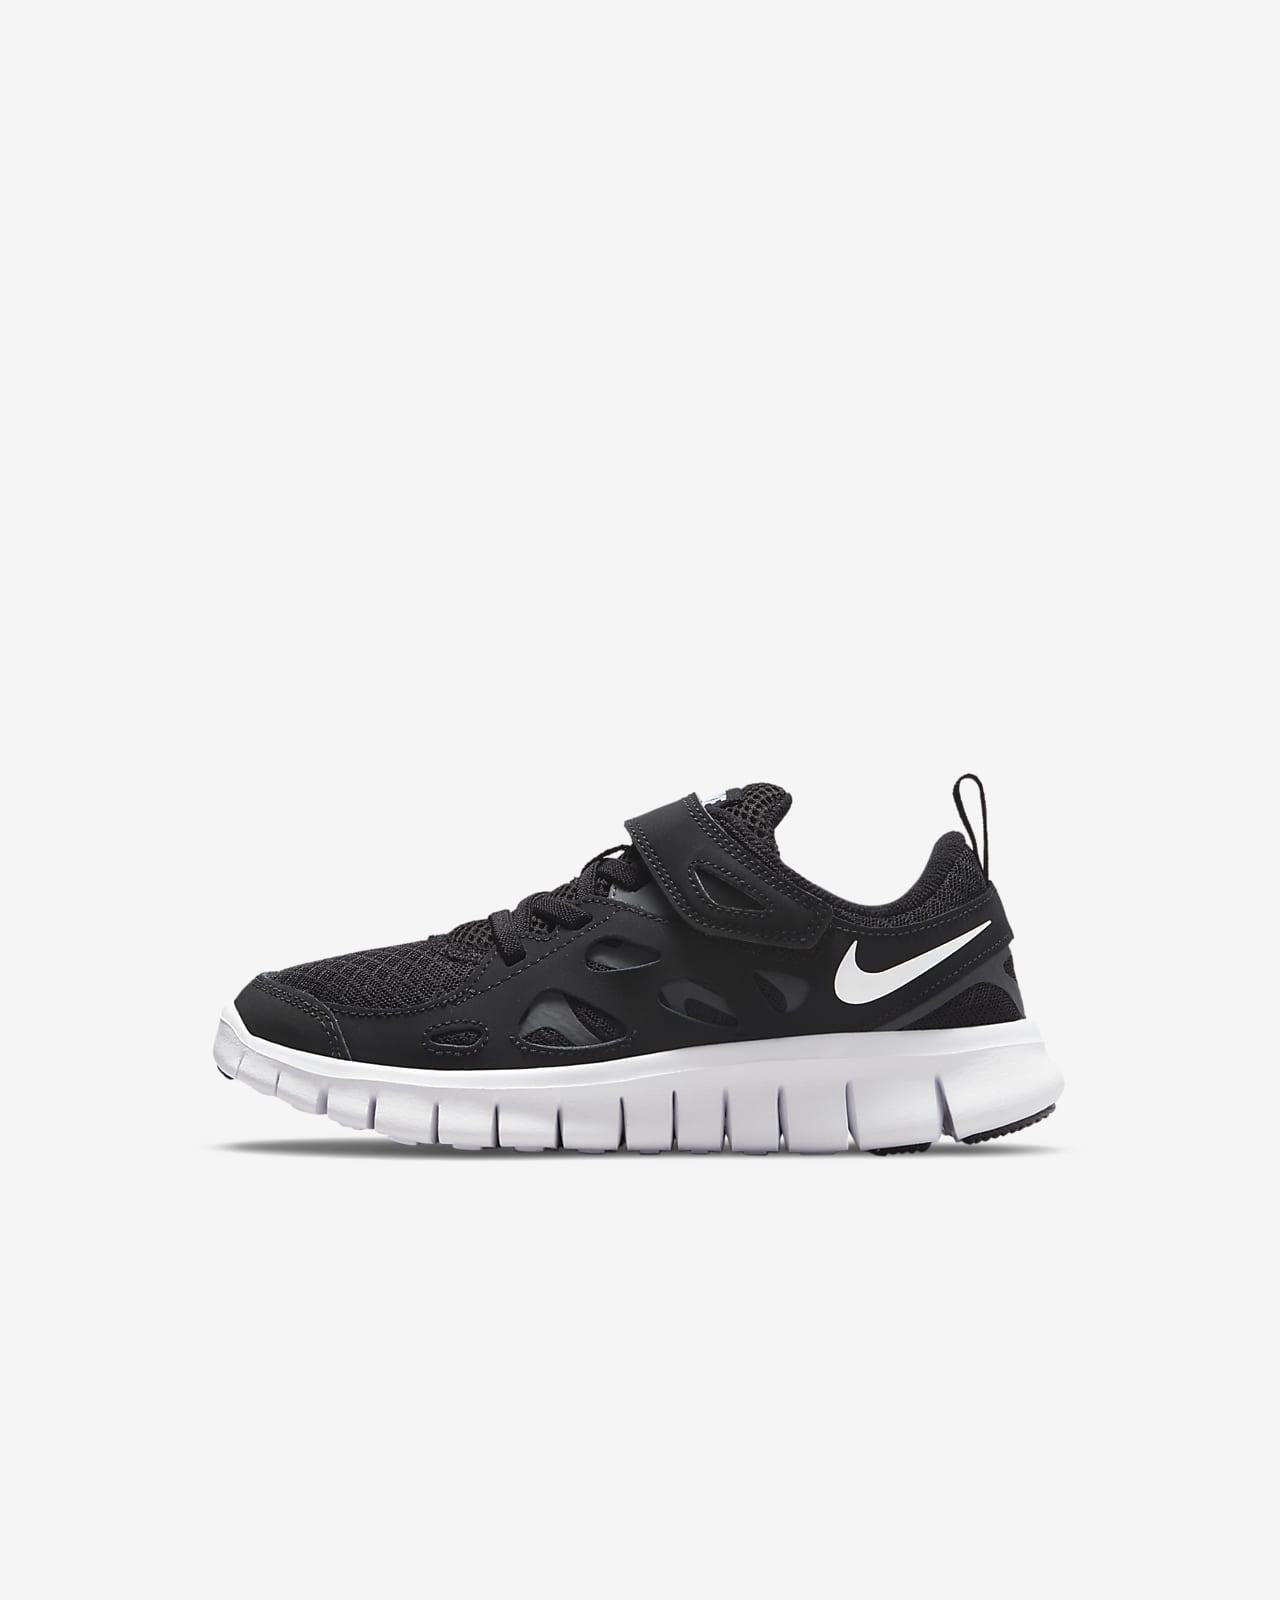 Chaussure Nike Free Run2 pour Jeune enfant